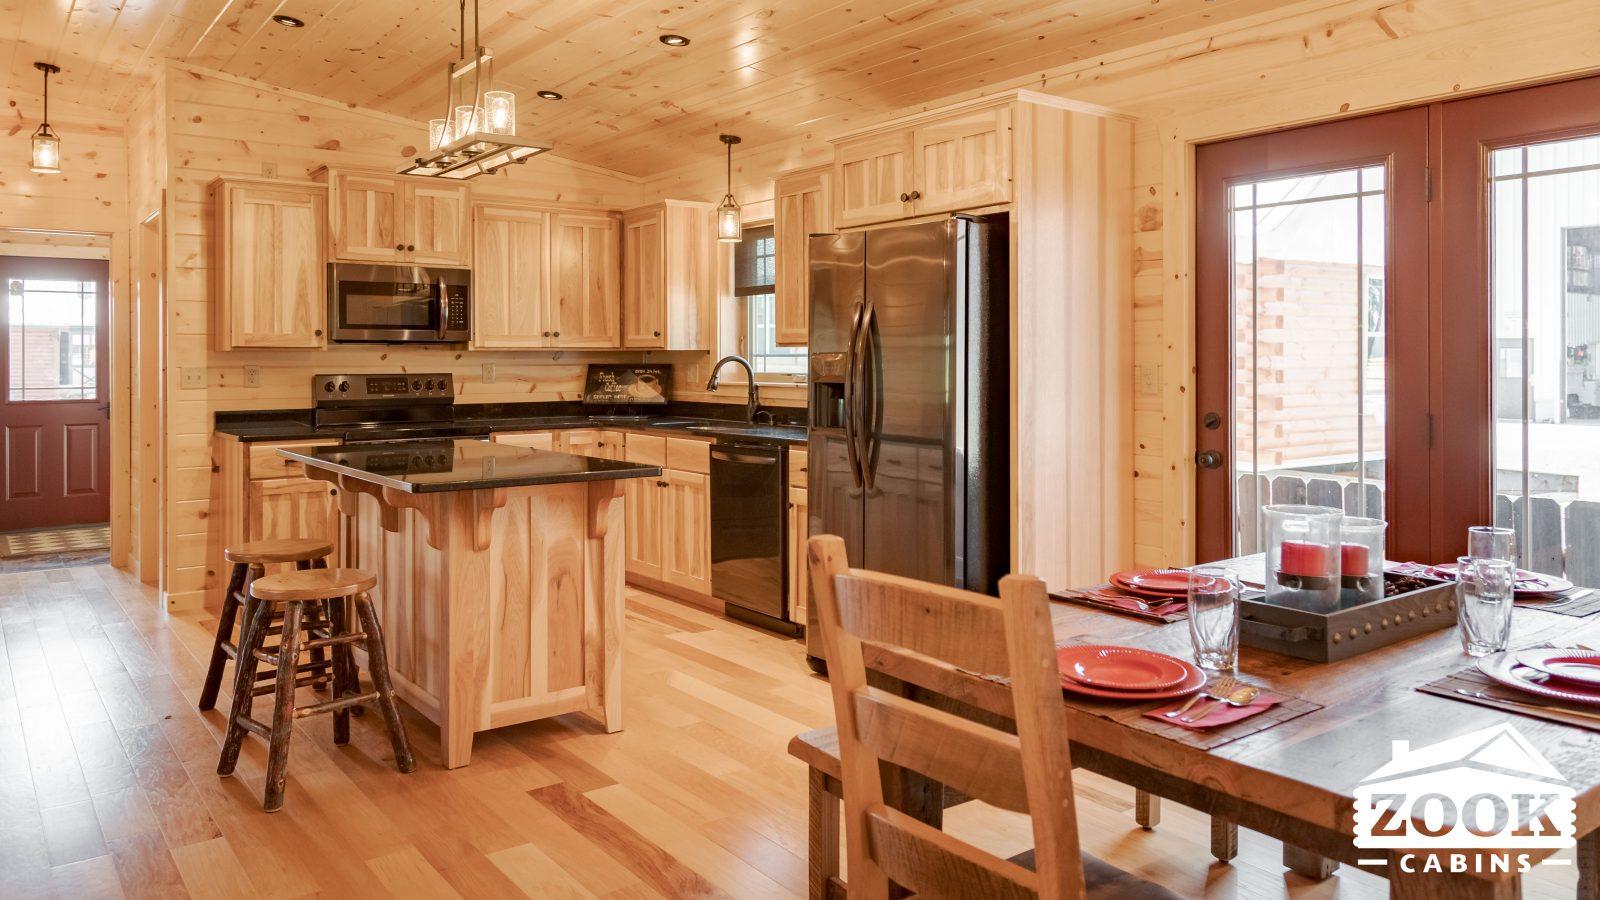 Log Cabins in South Carolina